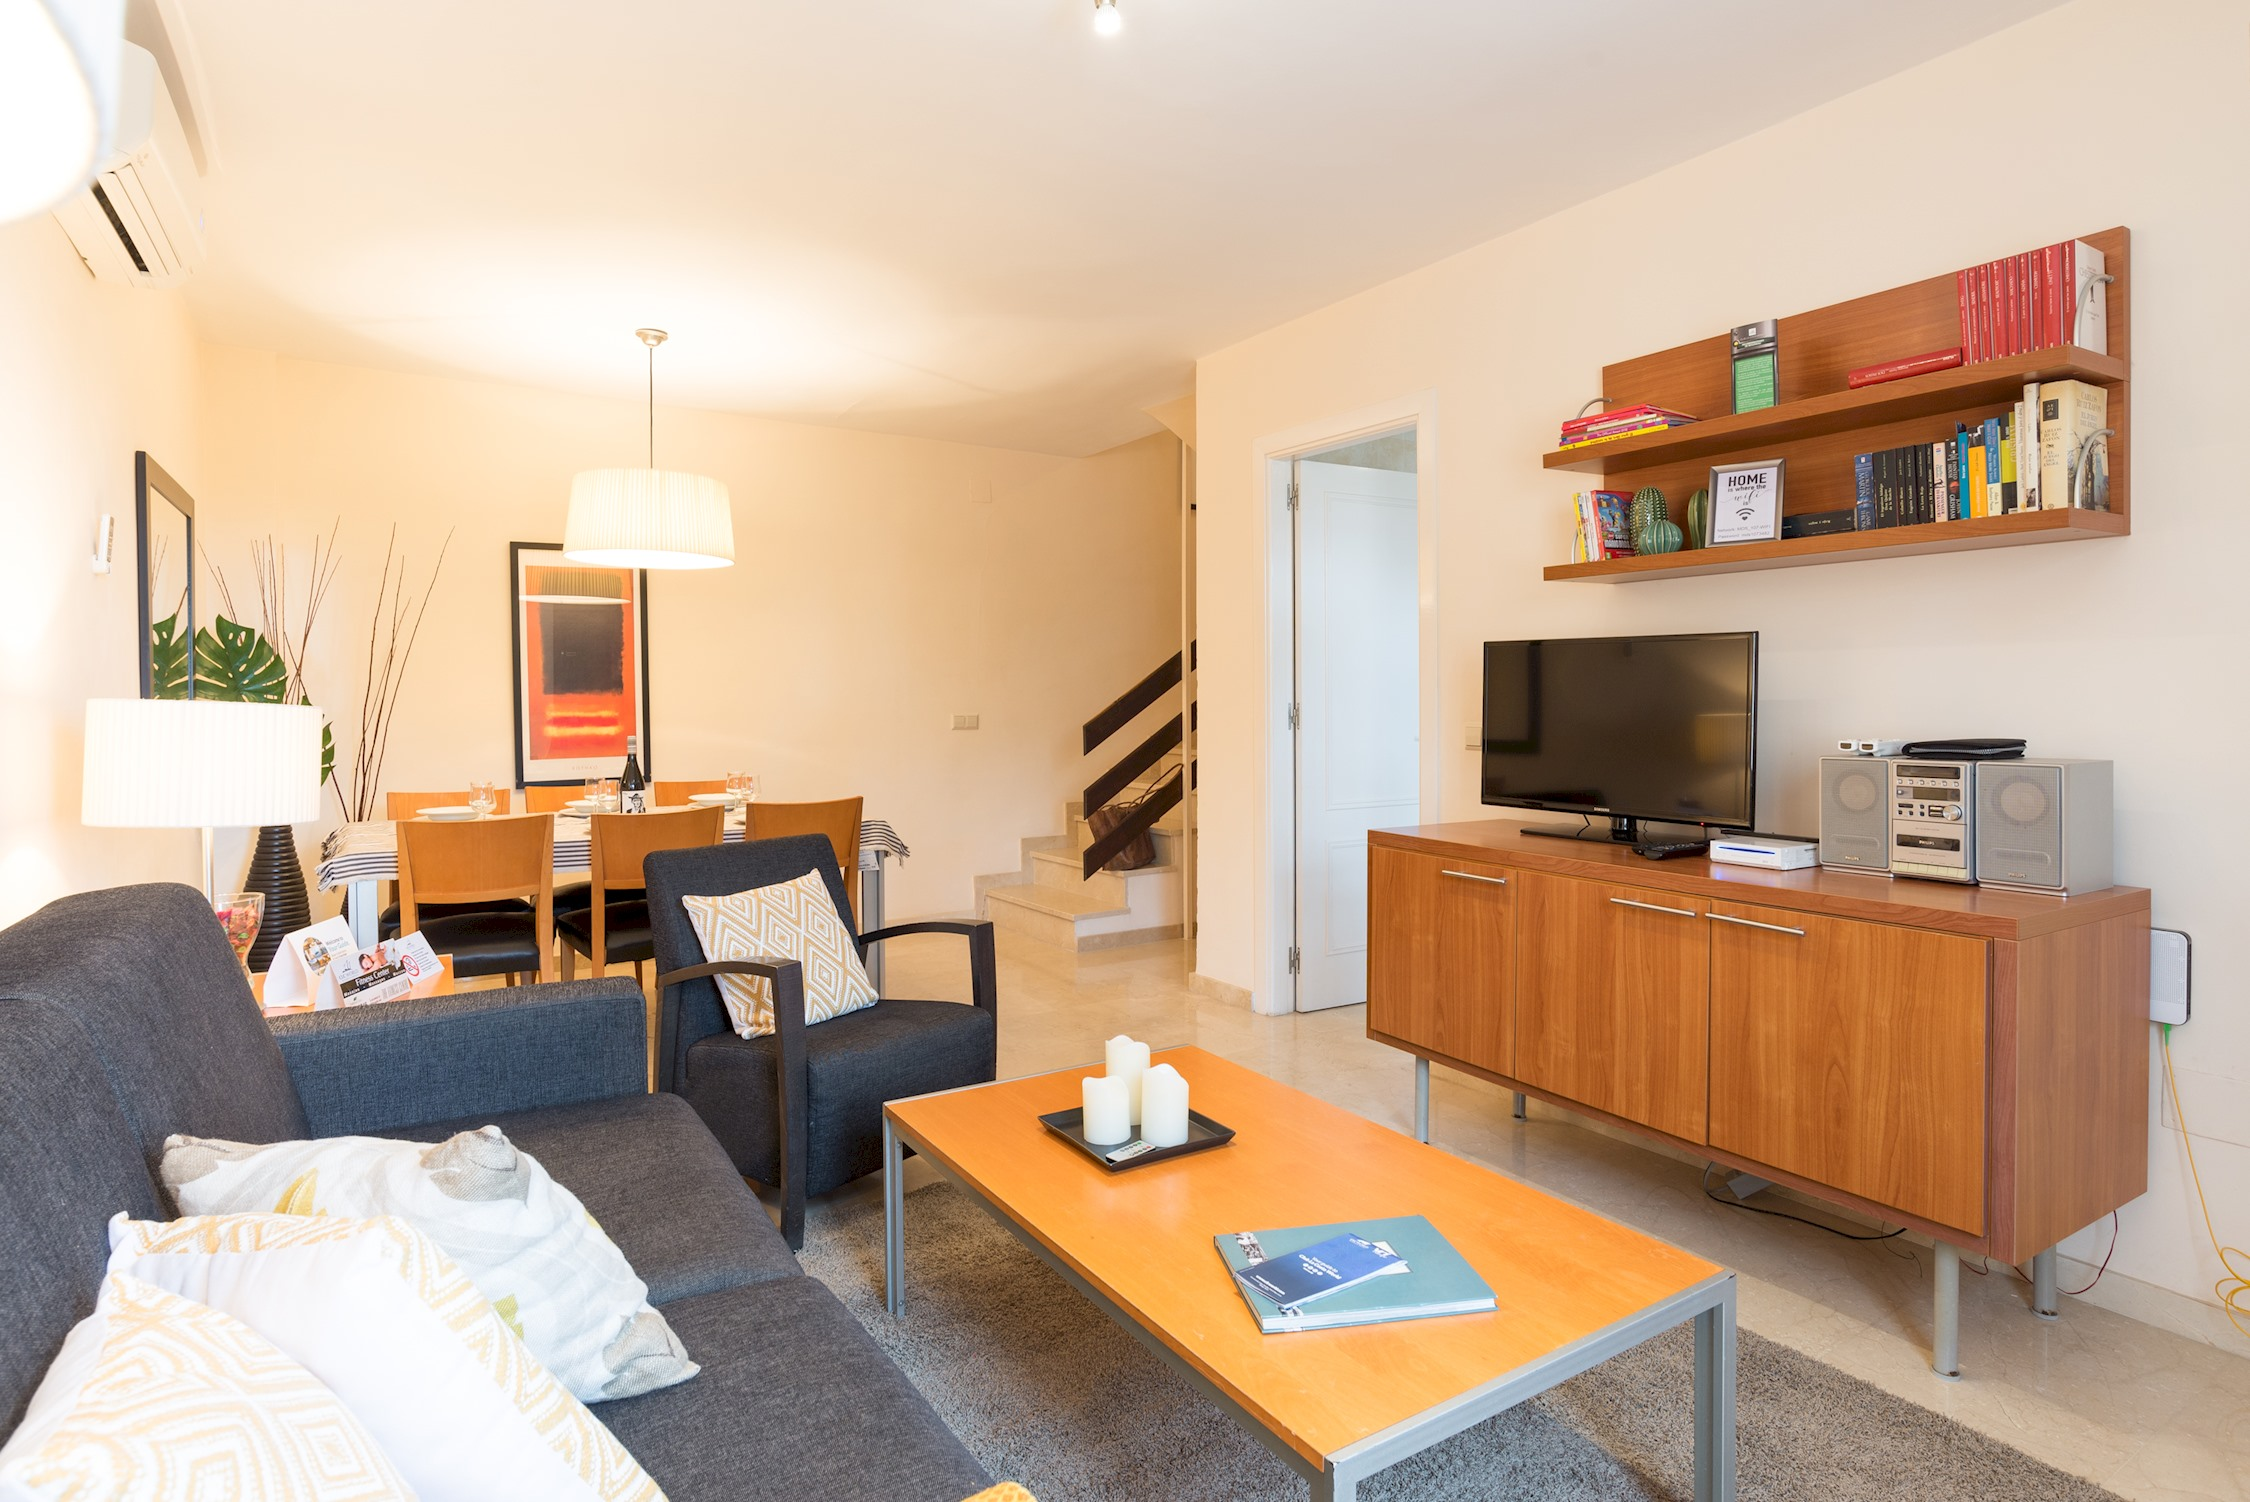 Apartment MalagaSuite Luxury   Relax photo 20237608